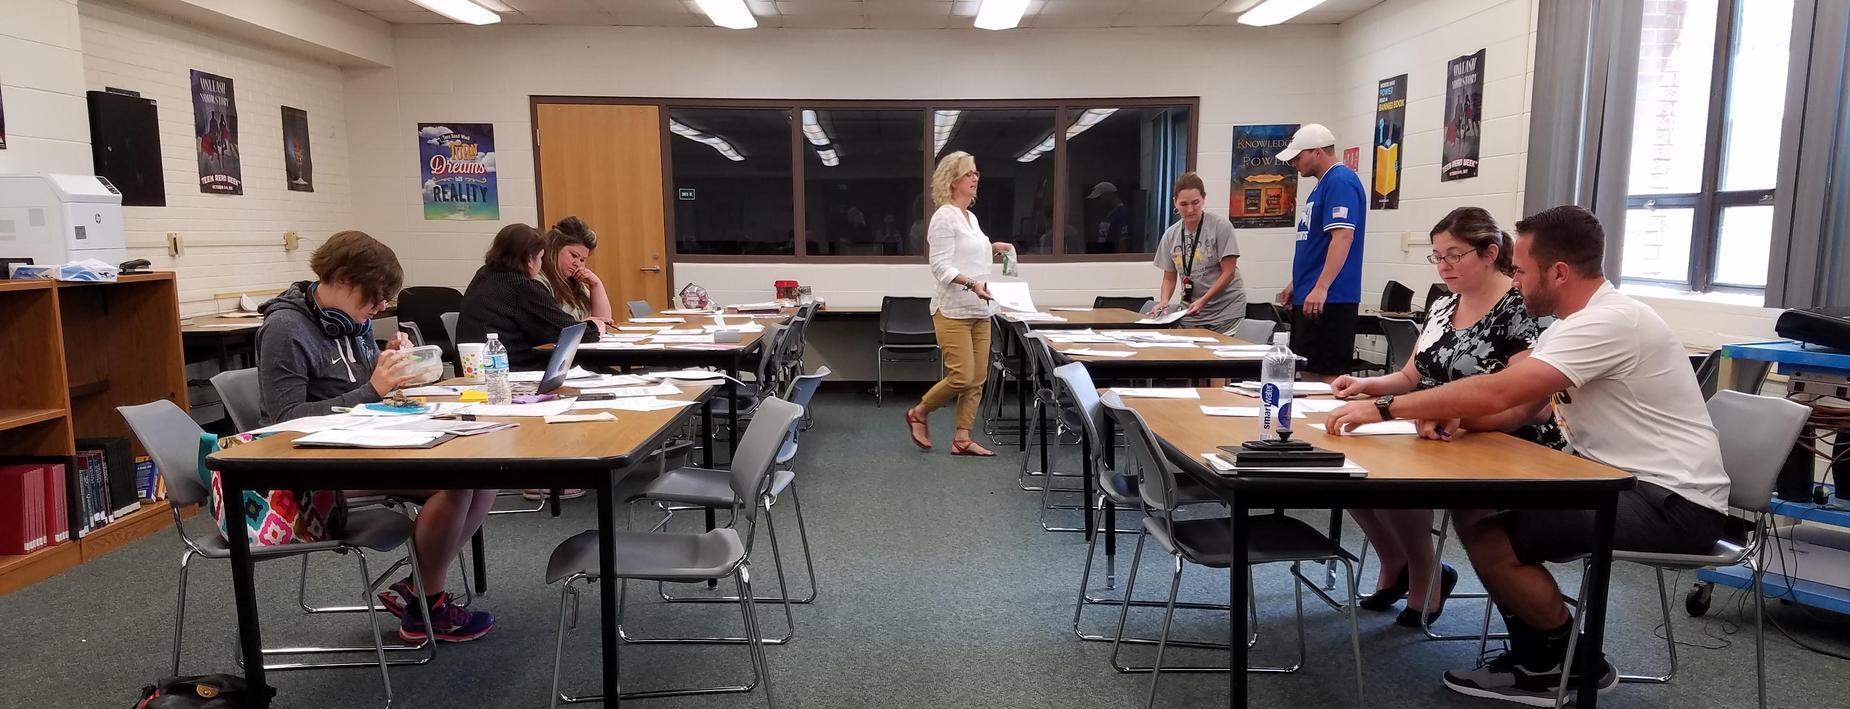 Teachers working over the summer